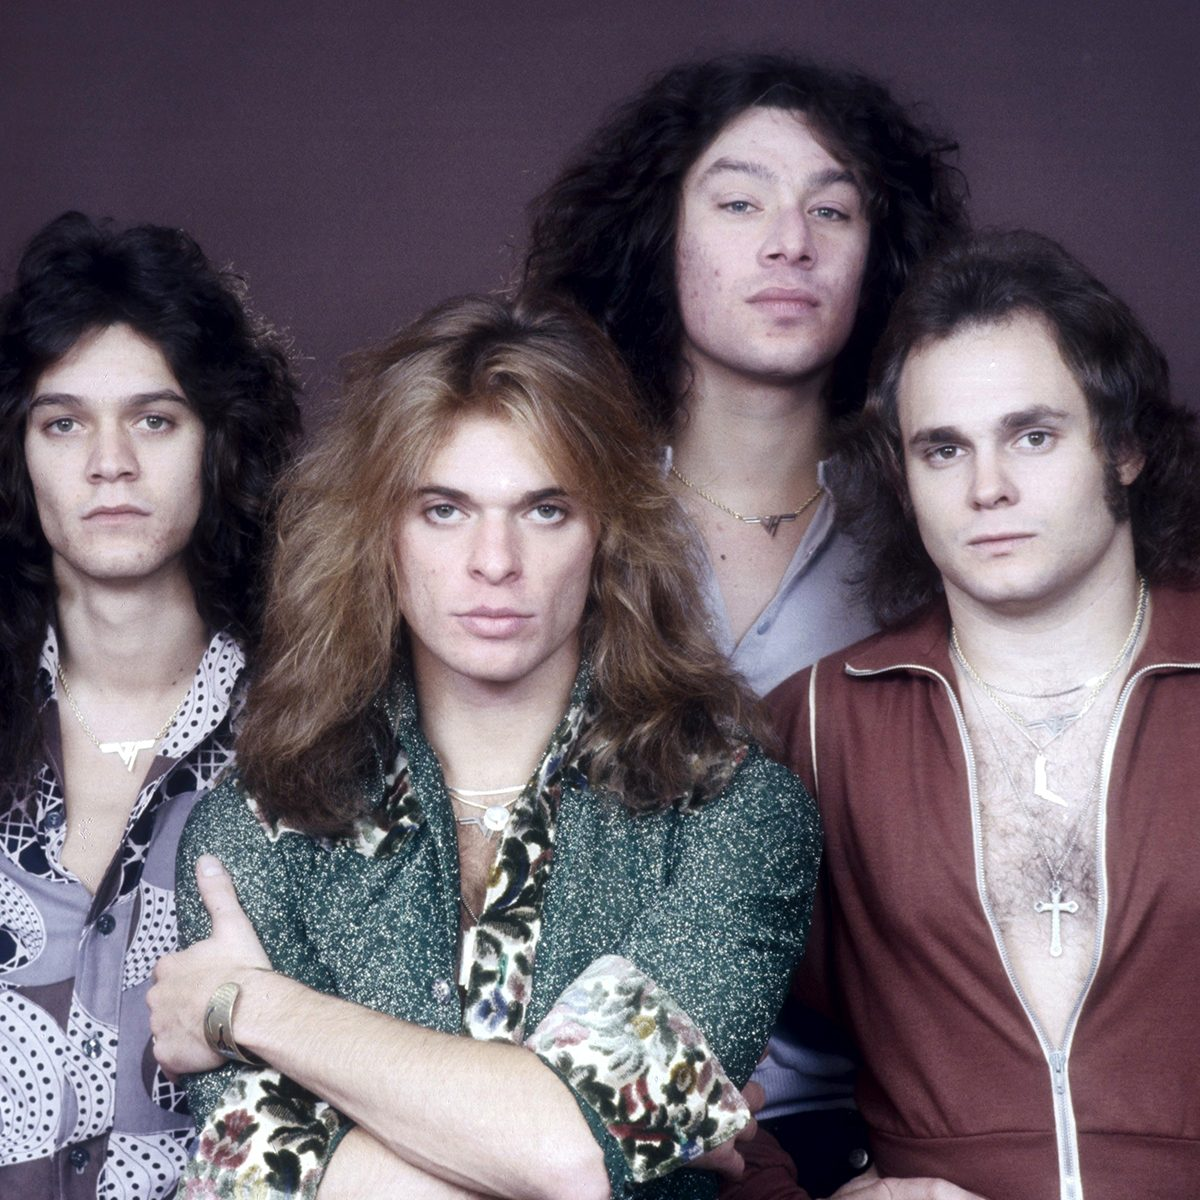 Mandatory Credit: Photo by Andre Csillag/Shutterstock (507570gx) Van Halen - Eddie Van Halen, David Lee Roth, Alex Van Halen and Michael Anthony in London, Britain - Oct 1978 VARIOUS